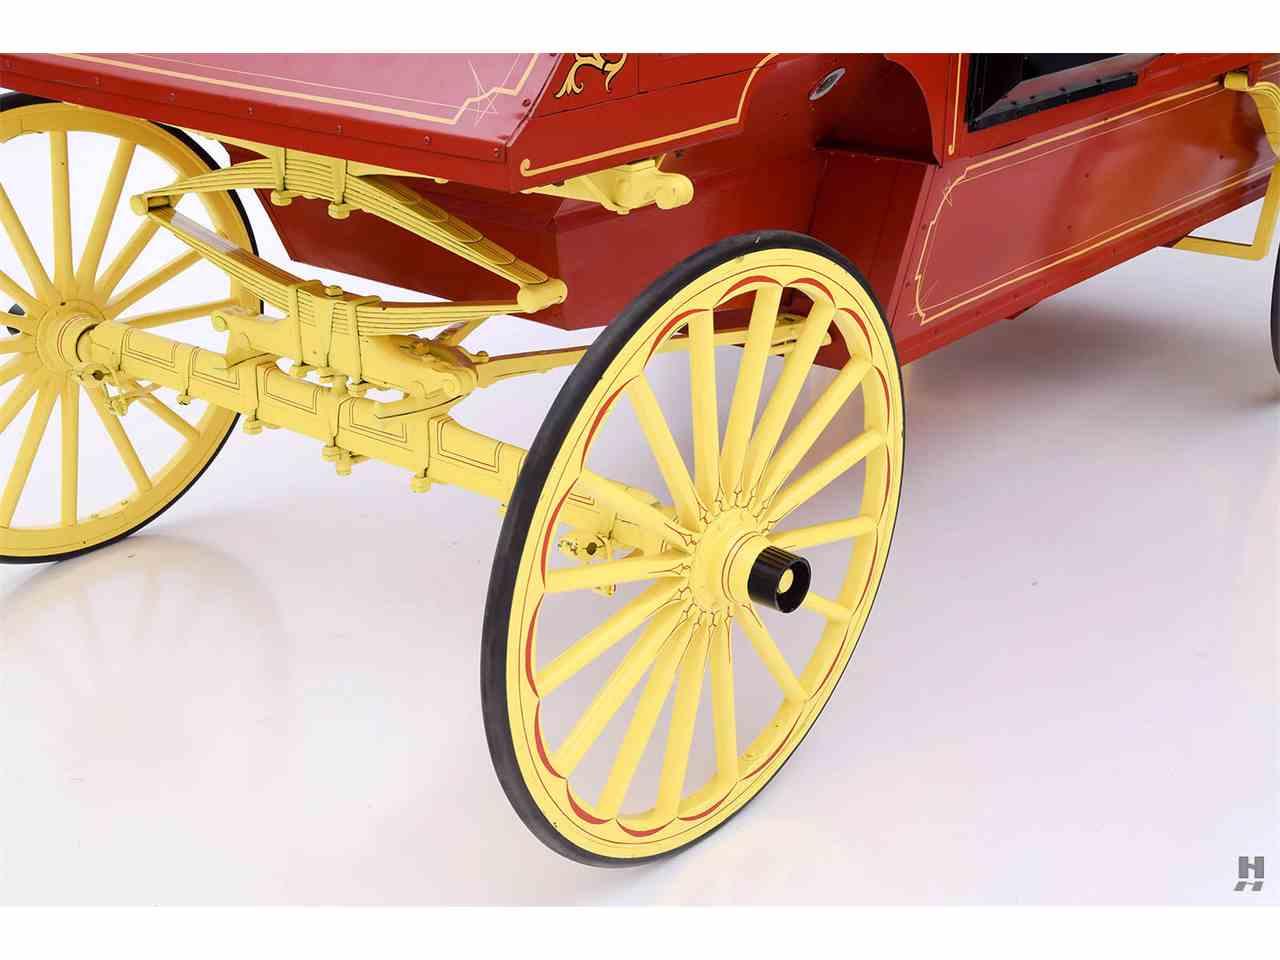 Large Picture of 1910 Cretors Model D located in Missouri - $68,500.00 - JMNV